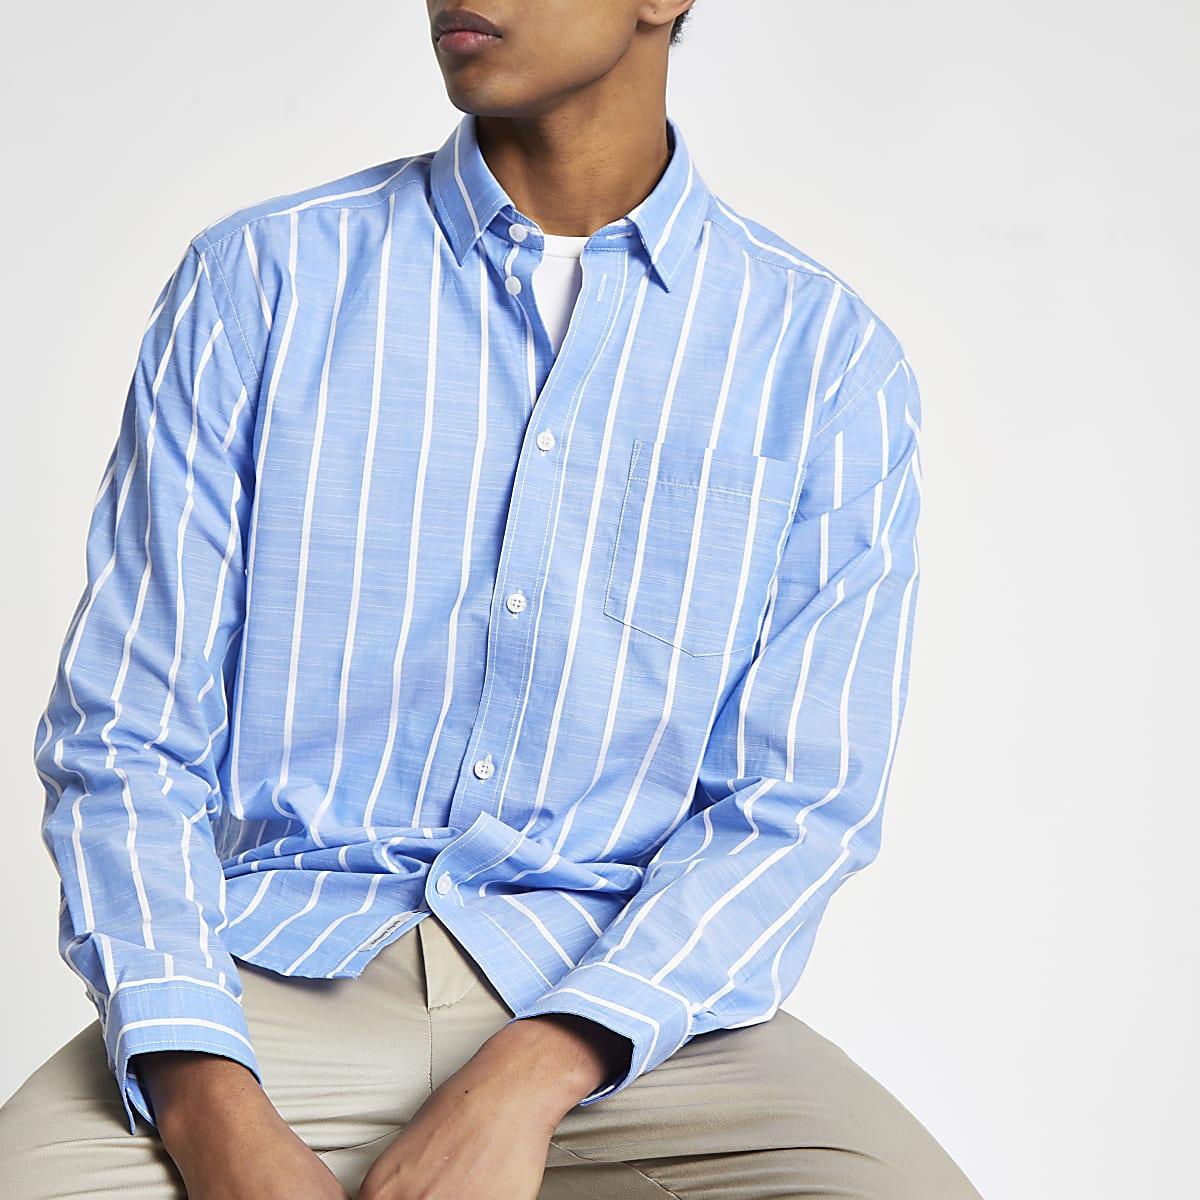 Minimum – Blaues, gestreiftes Langarmhemd